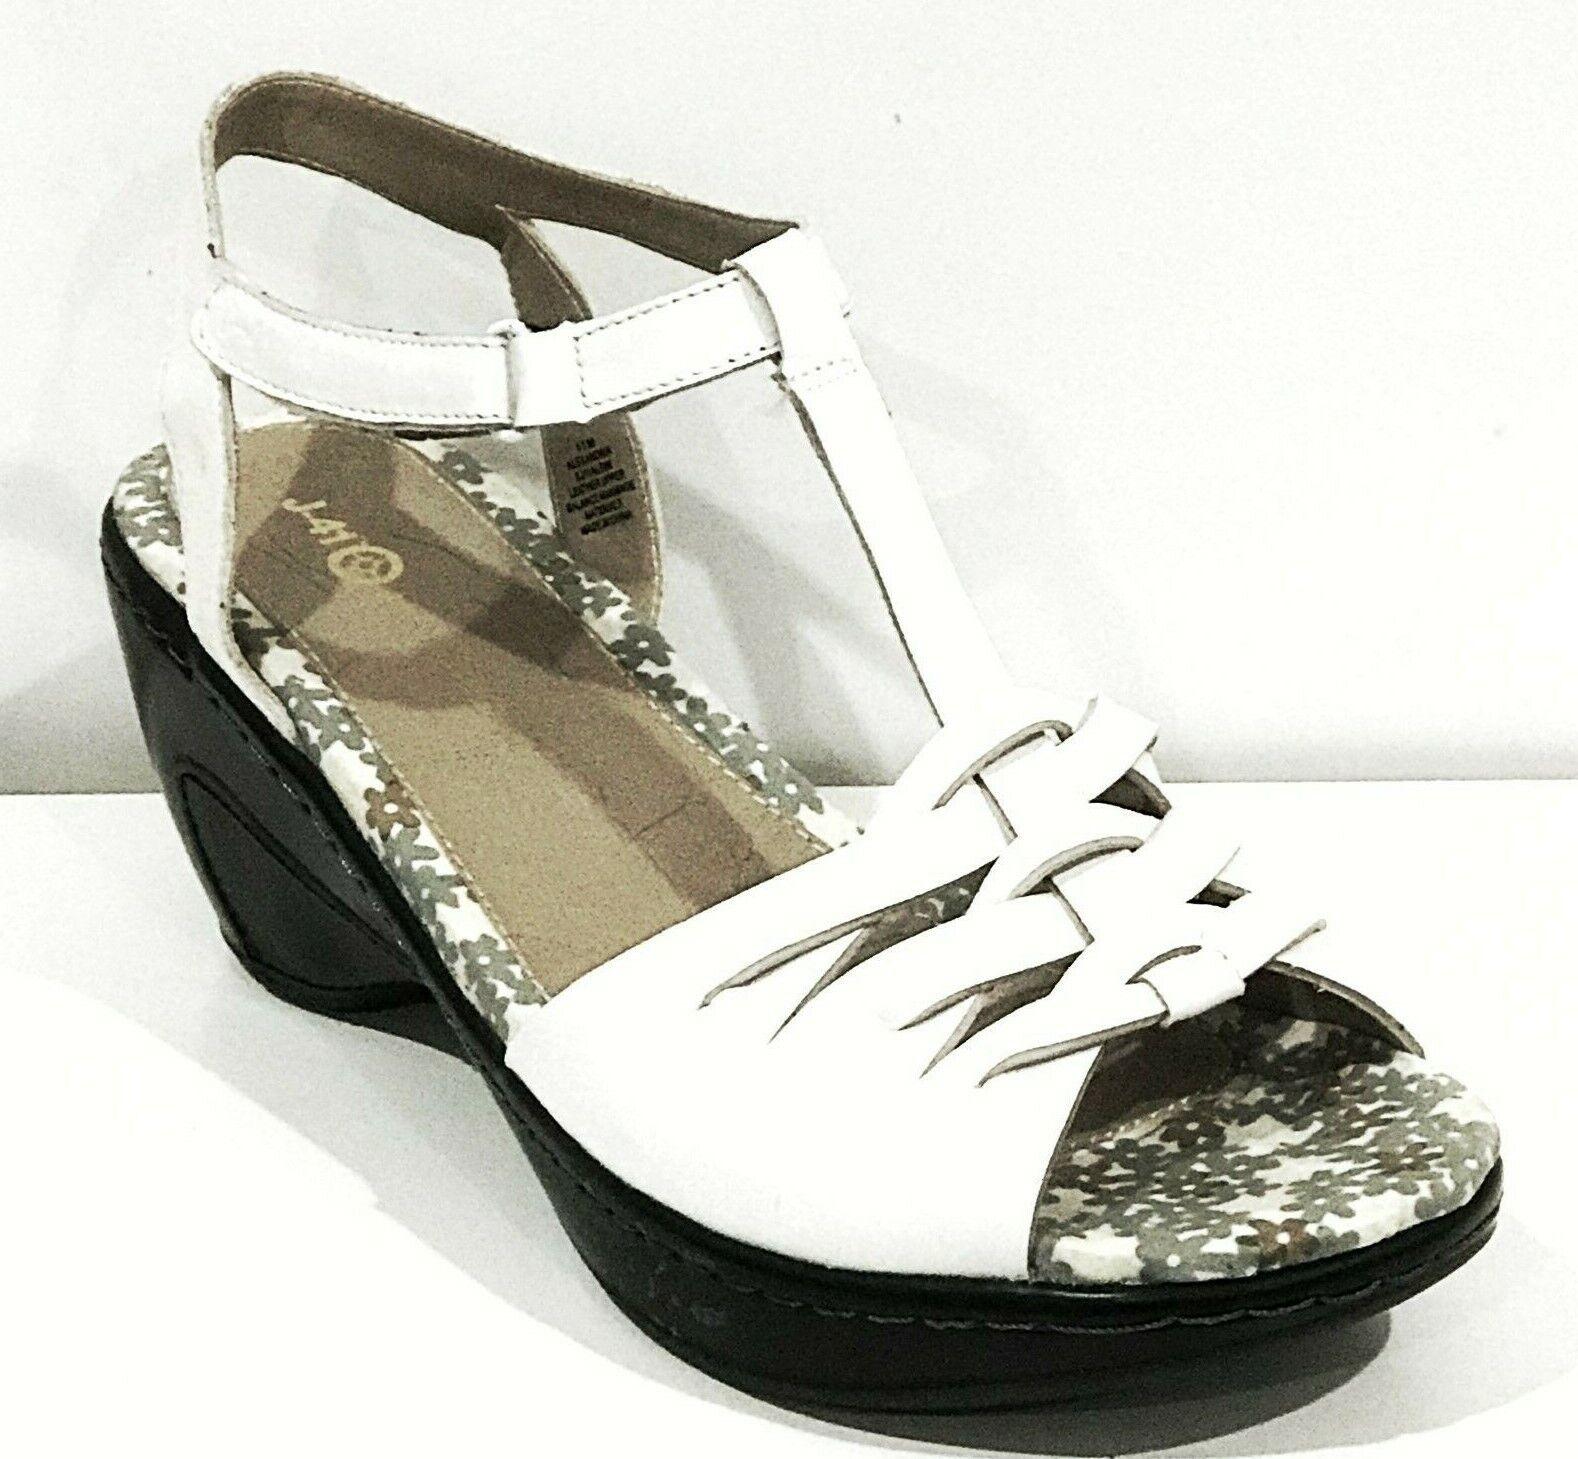 J-41 Femme ALEXANDRIA Platfor Wedge Sandales Chaussures Blanc 11 New in Box